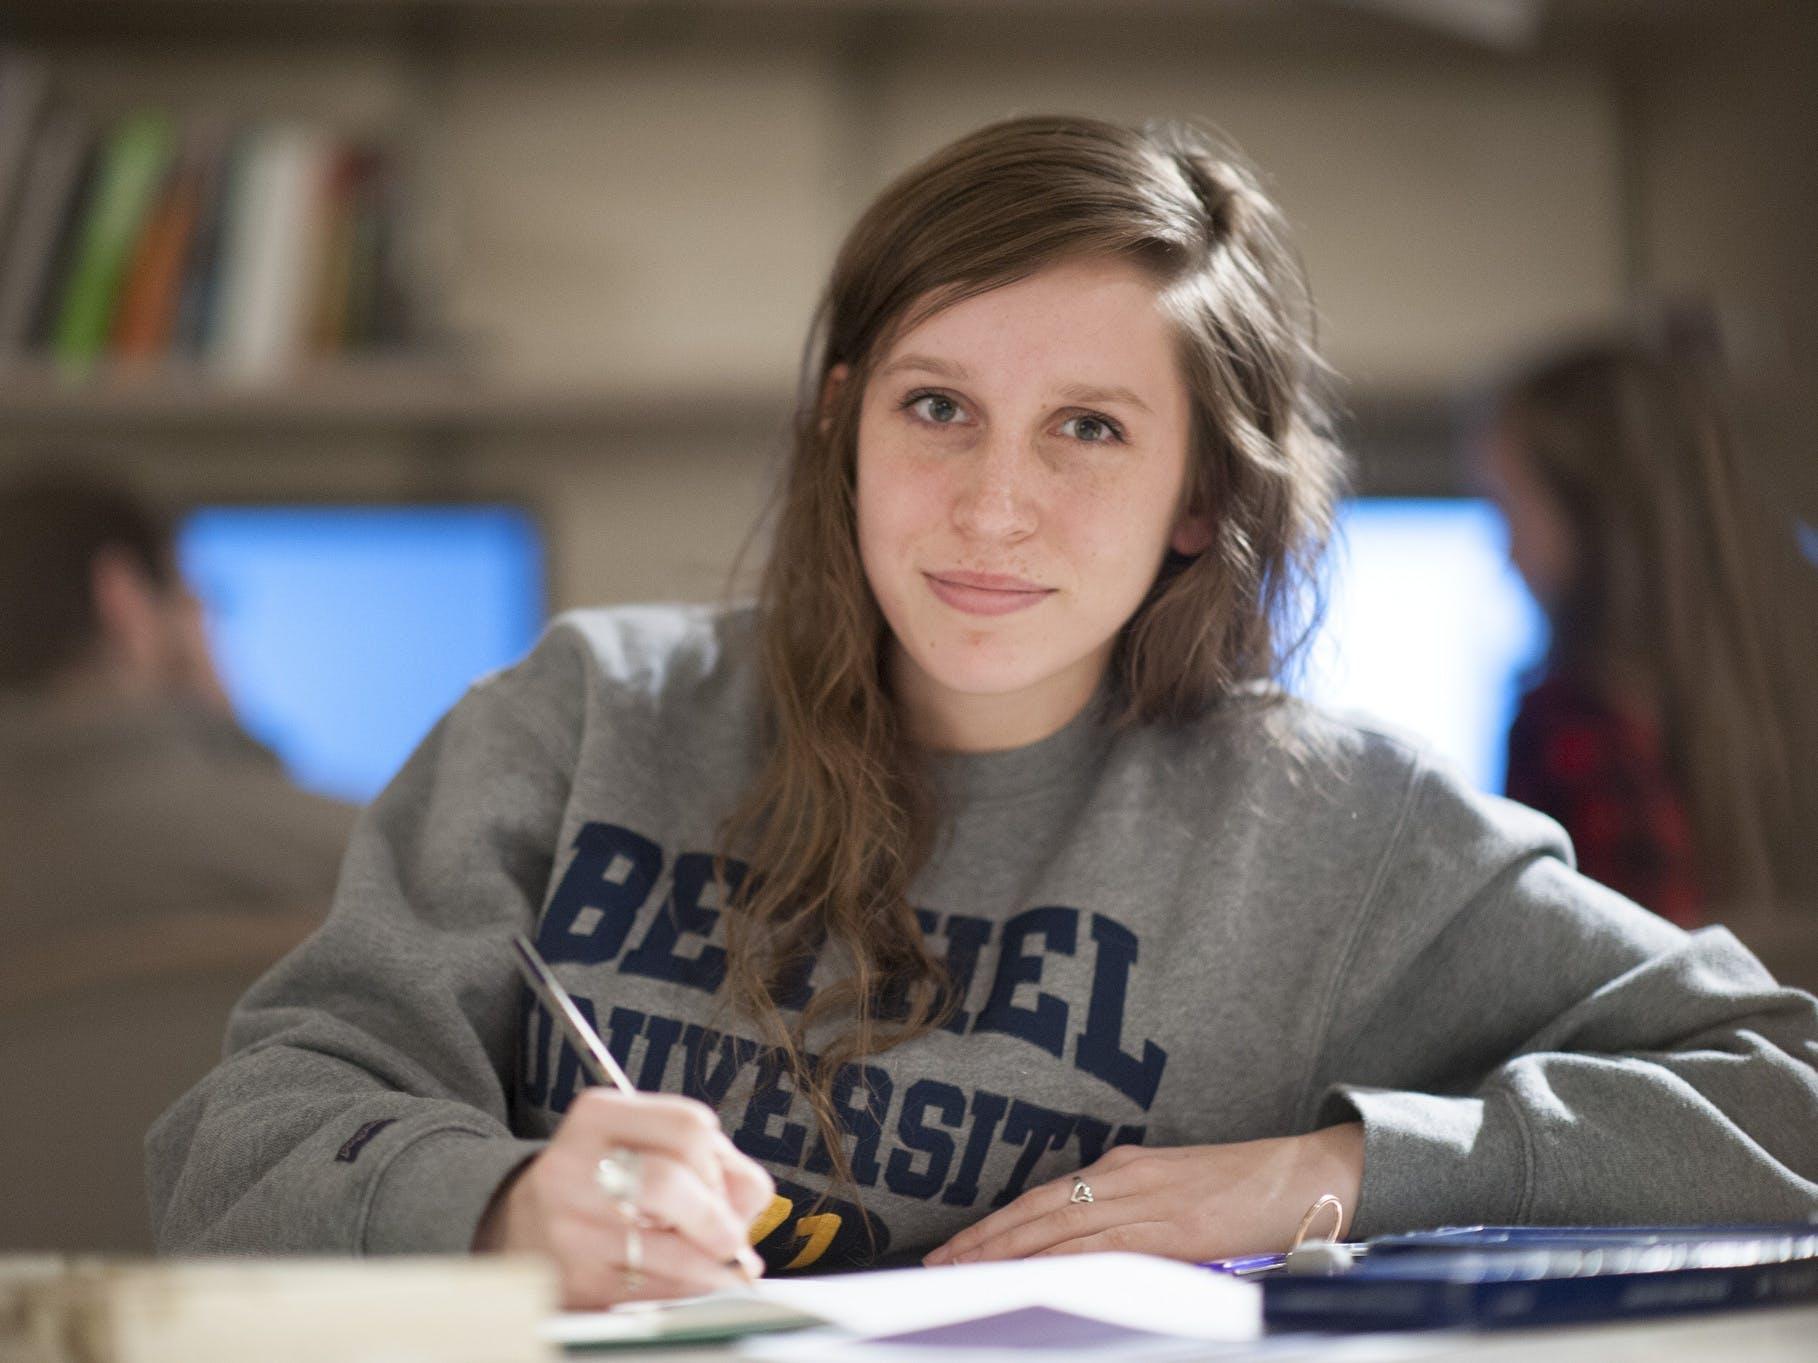 Bethel student smiling